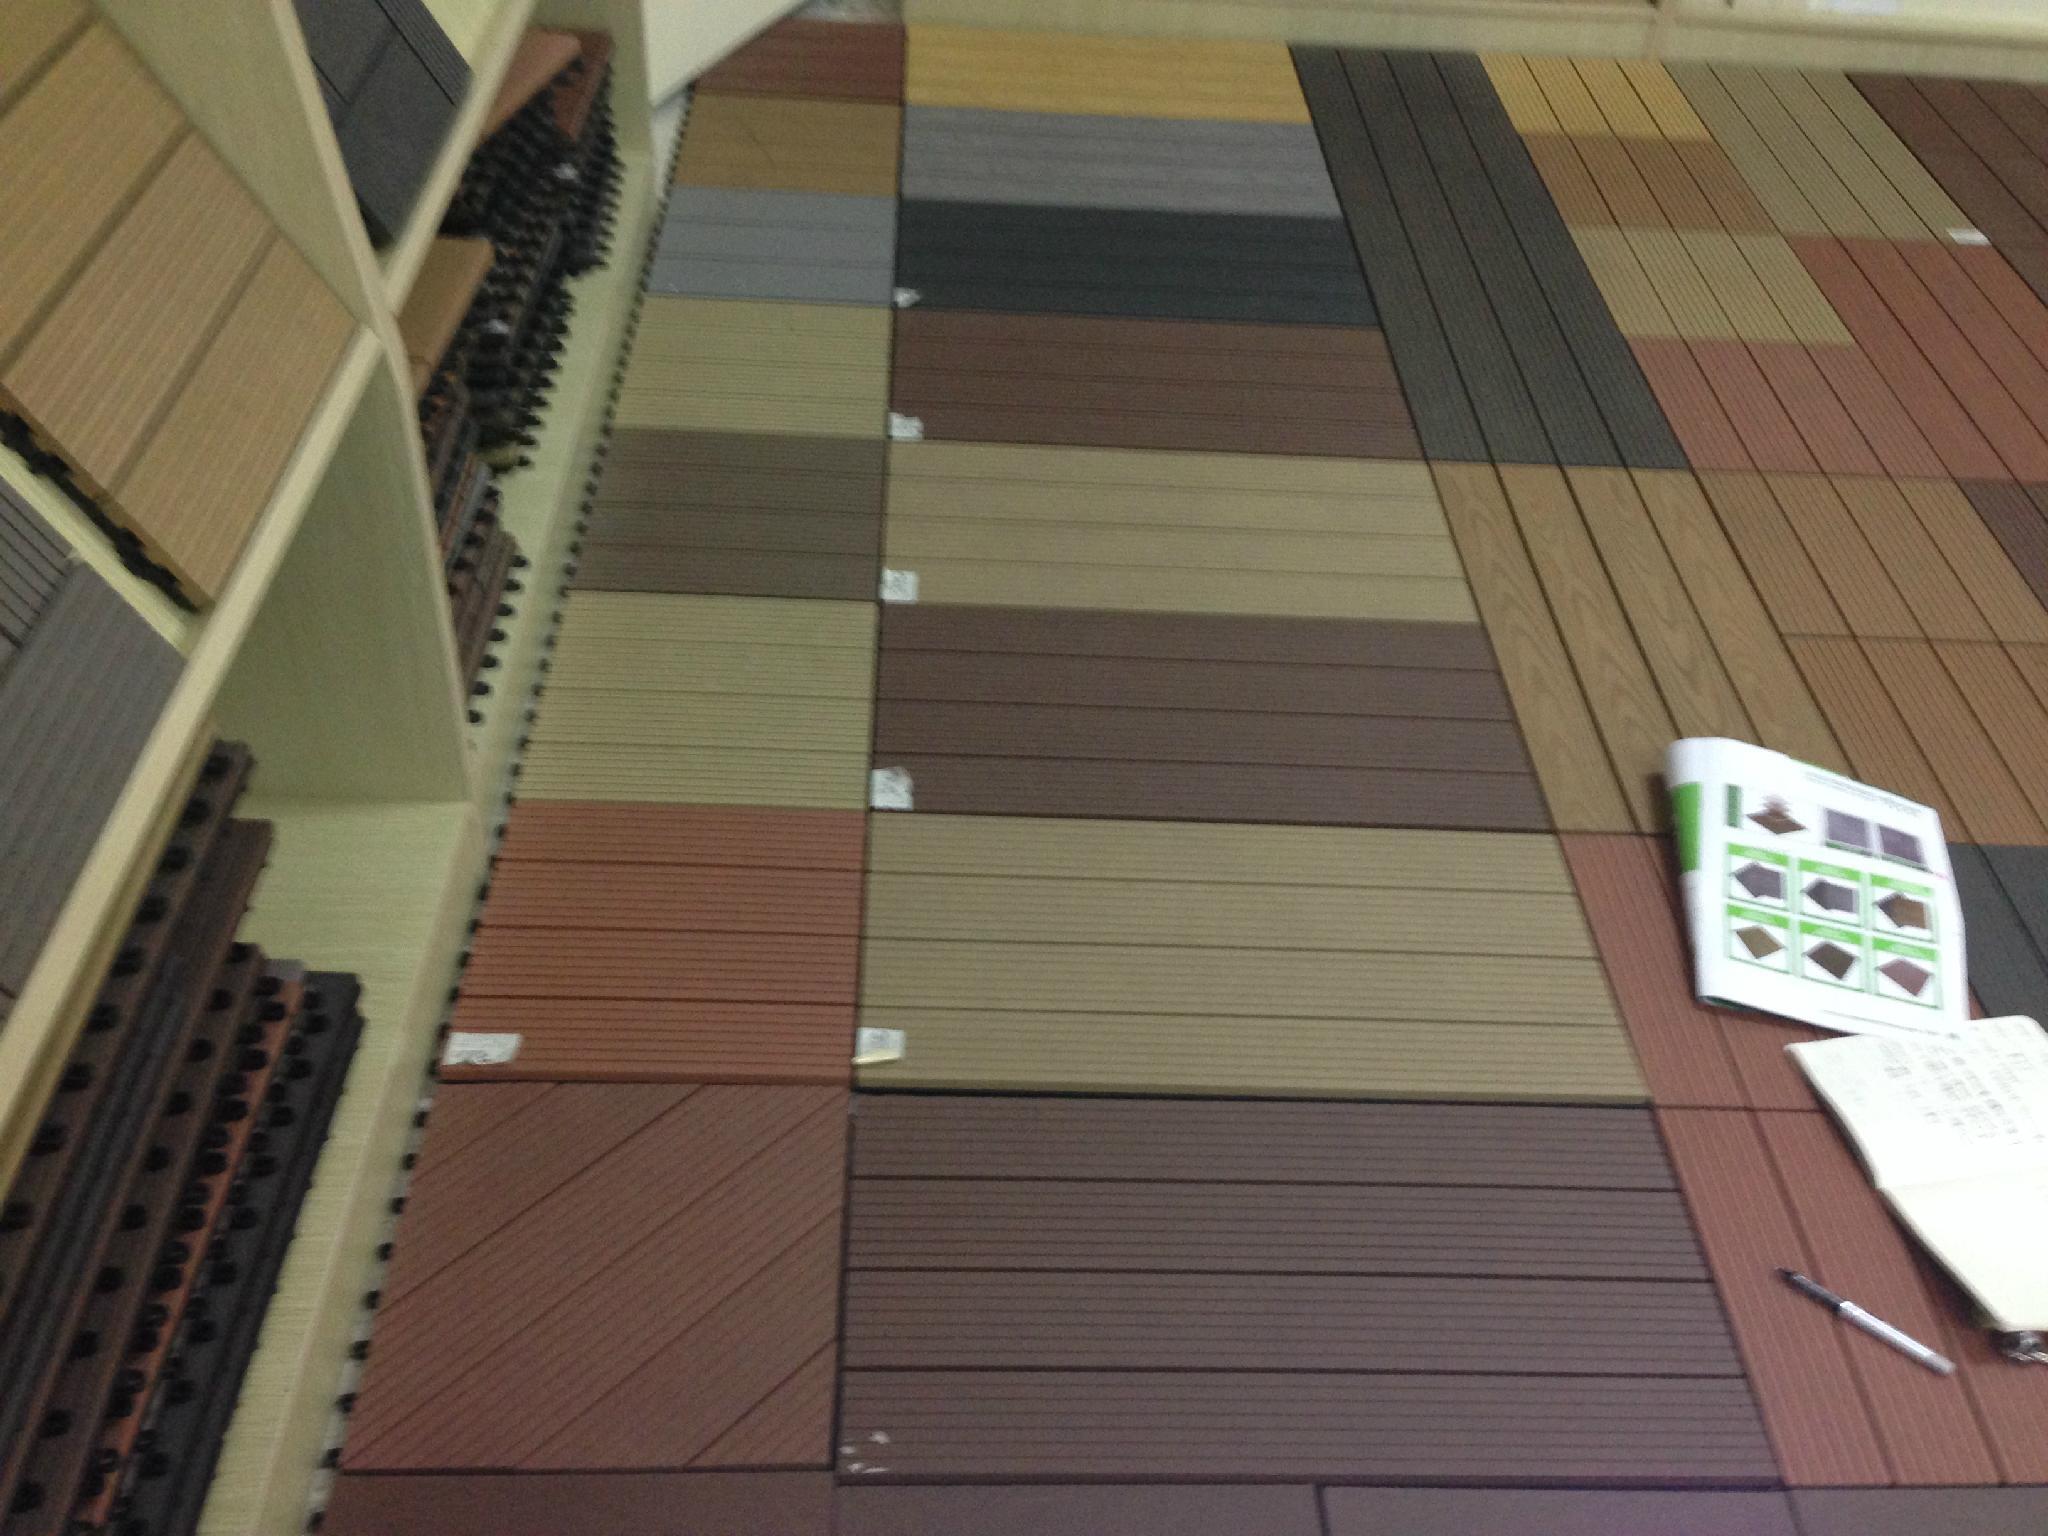 Composite Flooring Panels : Wood plastic composite tile gazebo terraced decking